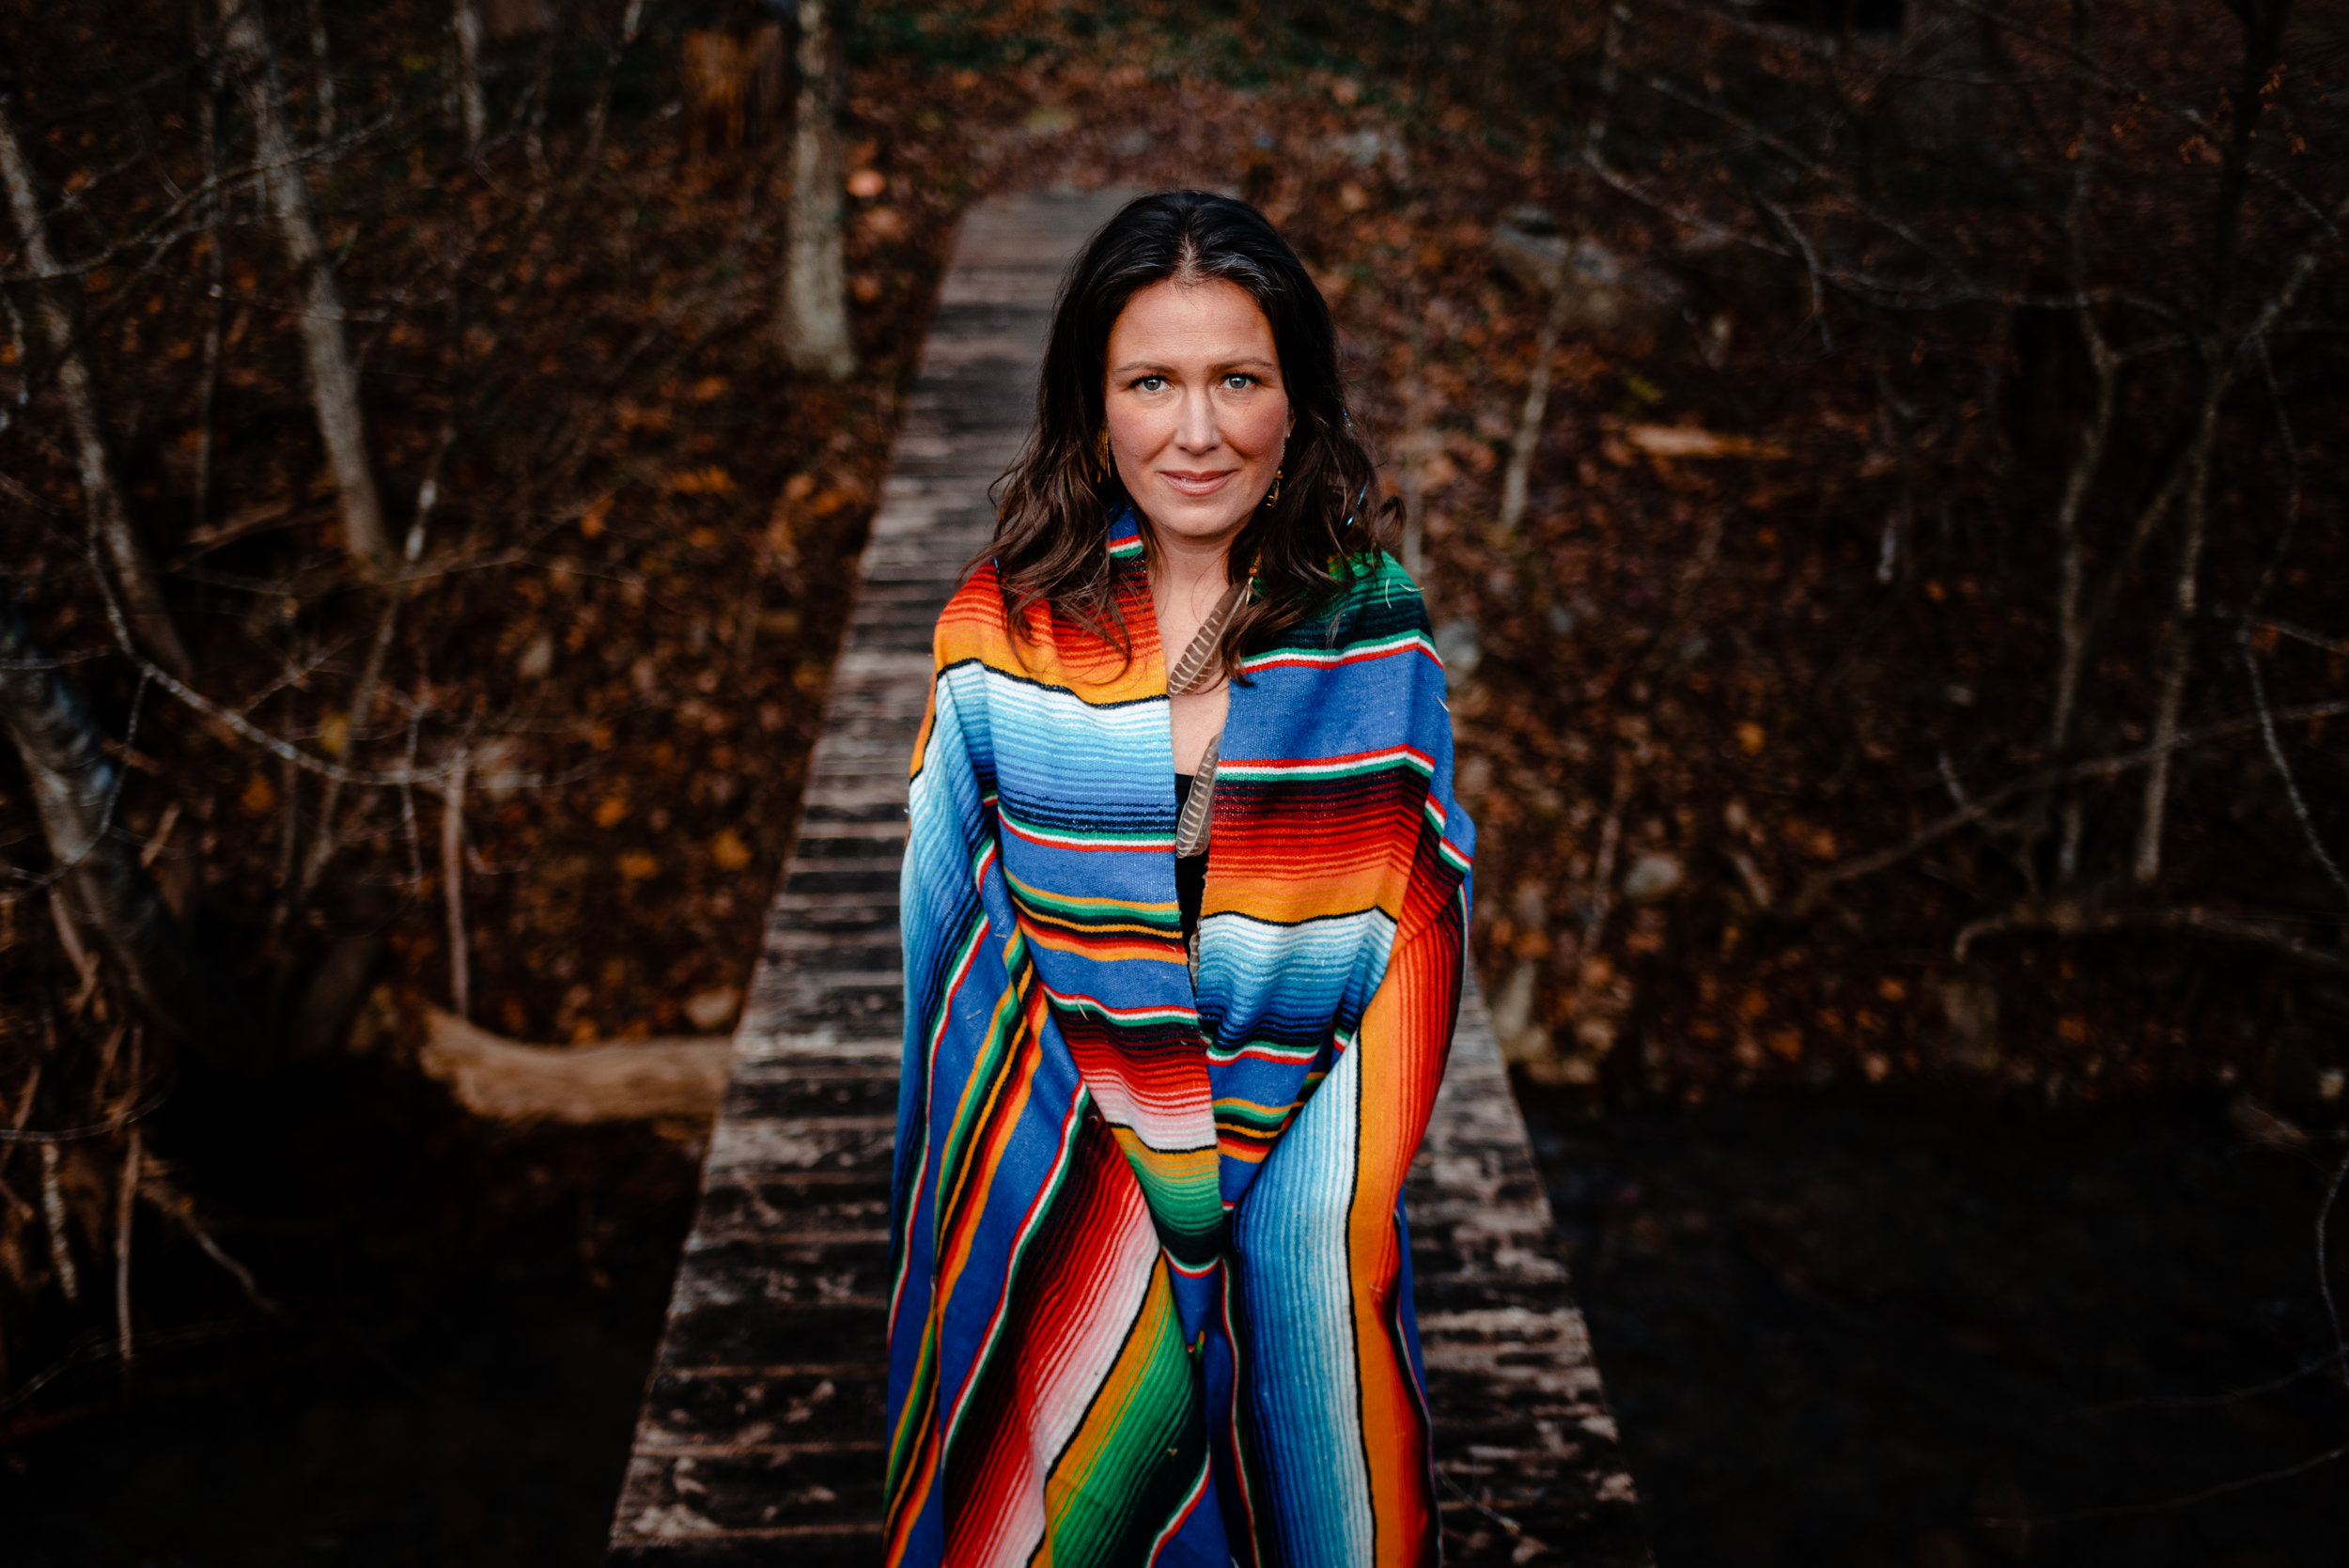 Chloë Rain, Spiritual Guide & Founder of Explore Deeply